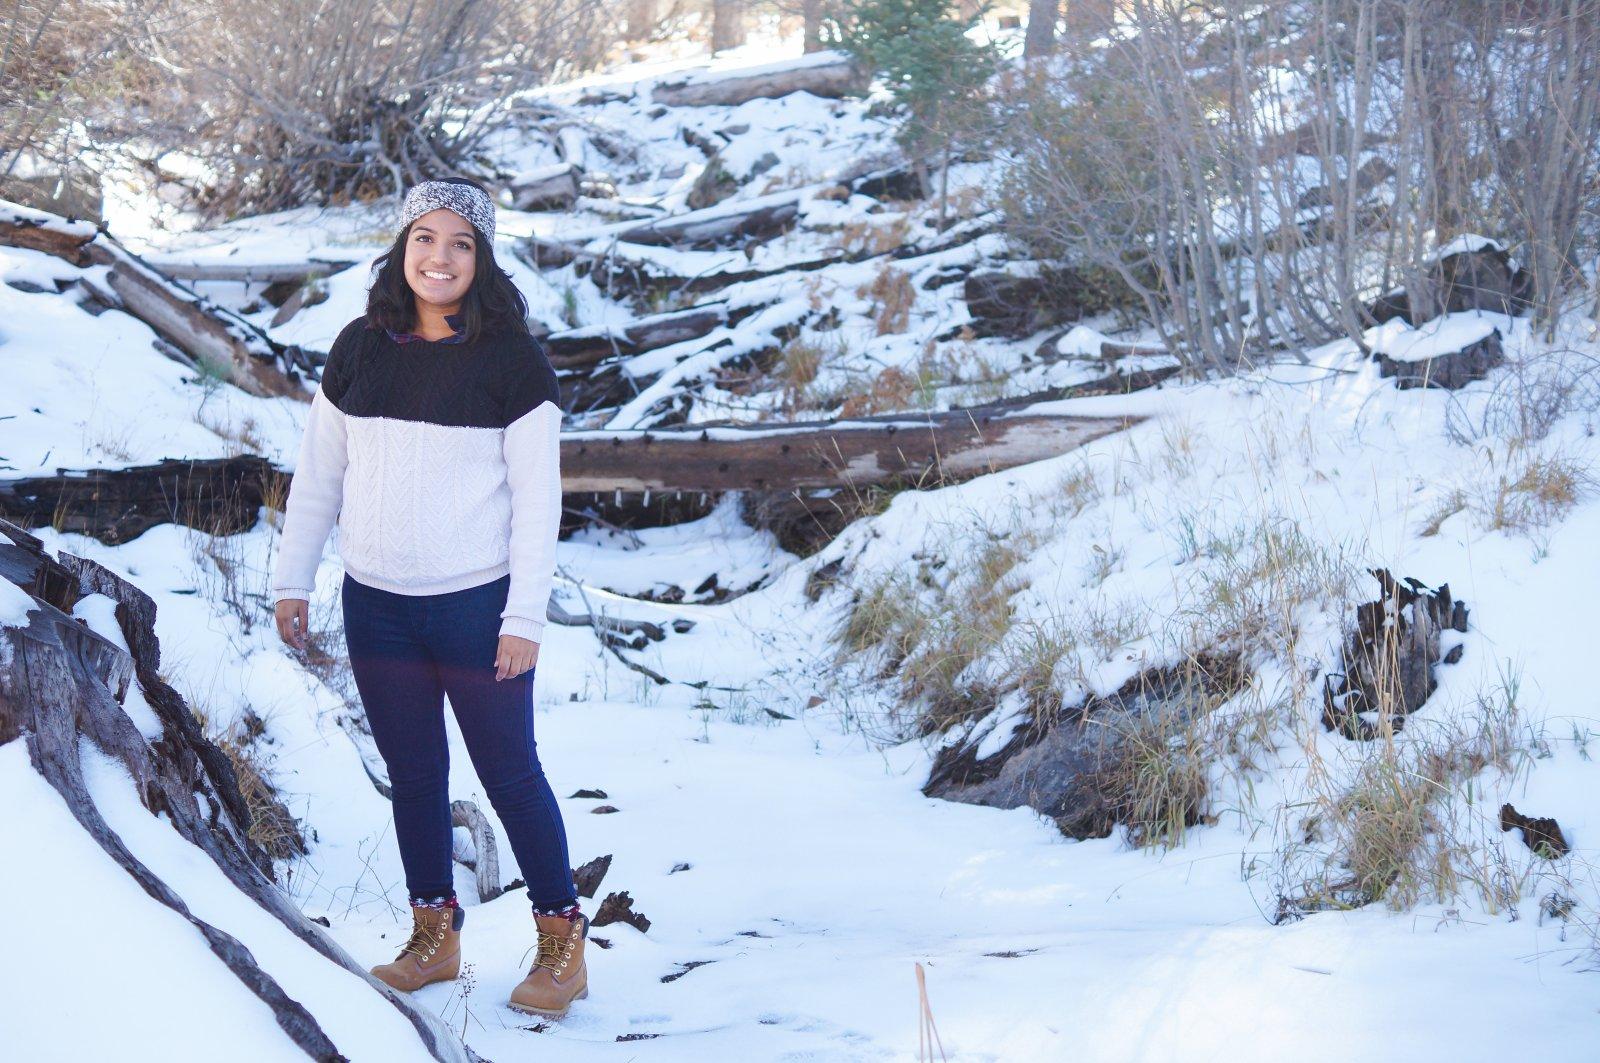 Winter Scenery at Big Bear Lake